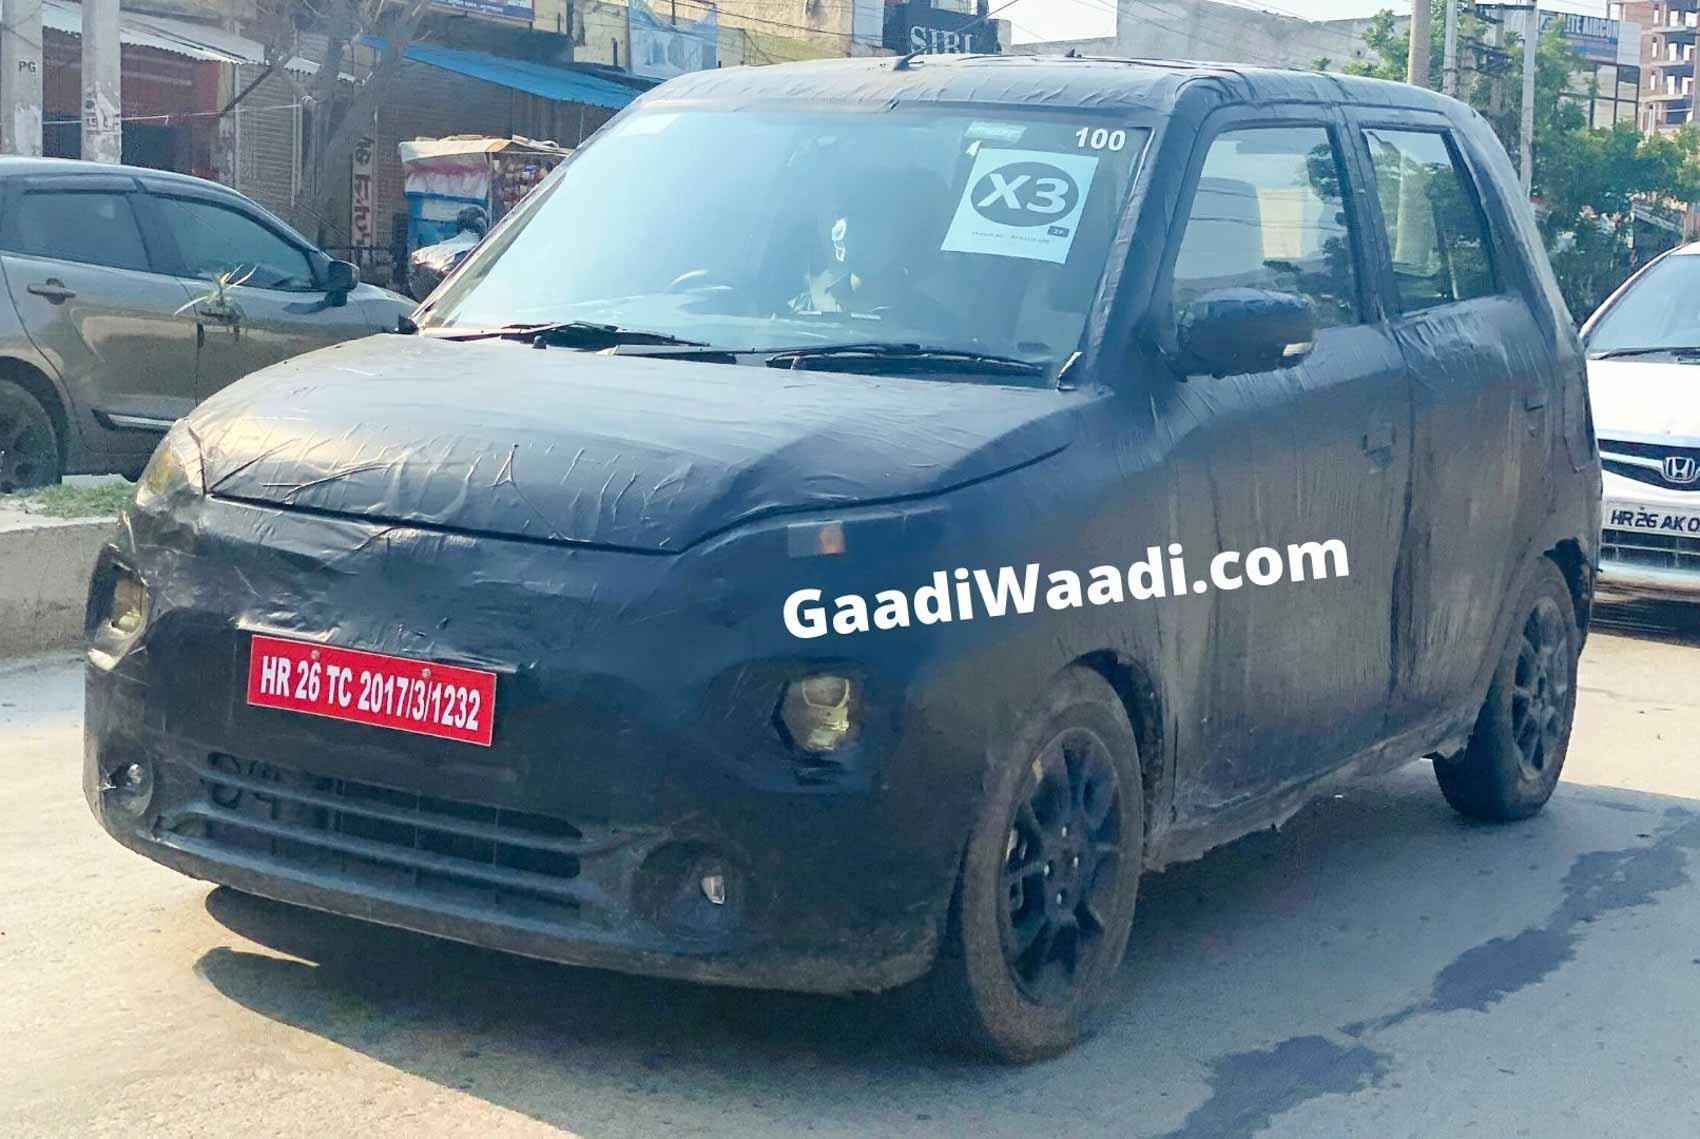 Production-Spec Maruti Suzuki Wagon R Electric Spied Testing Again